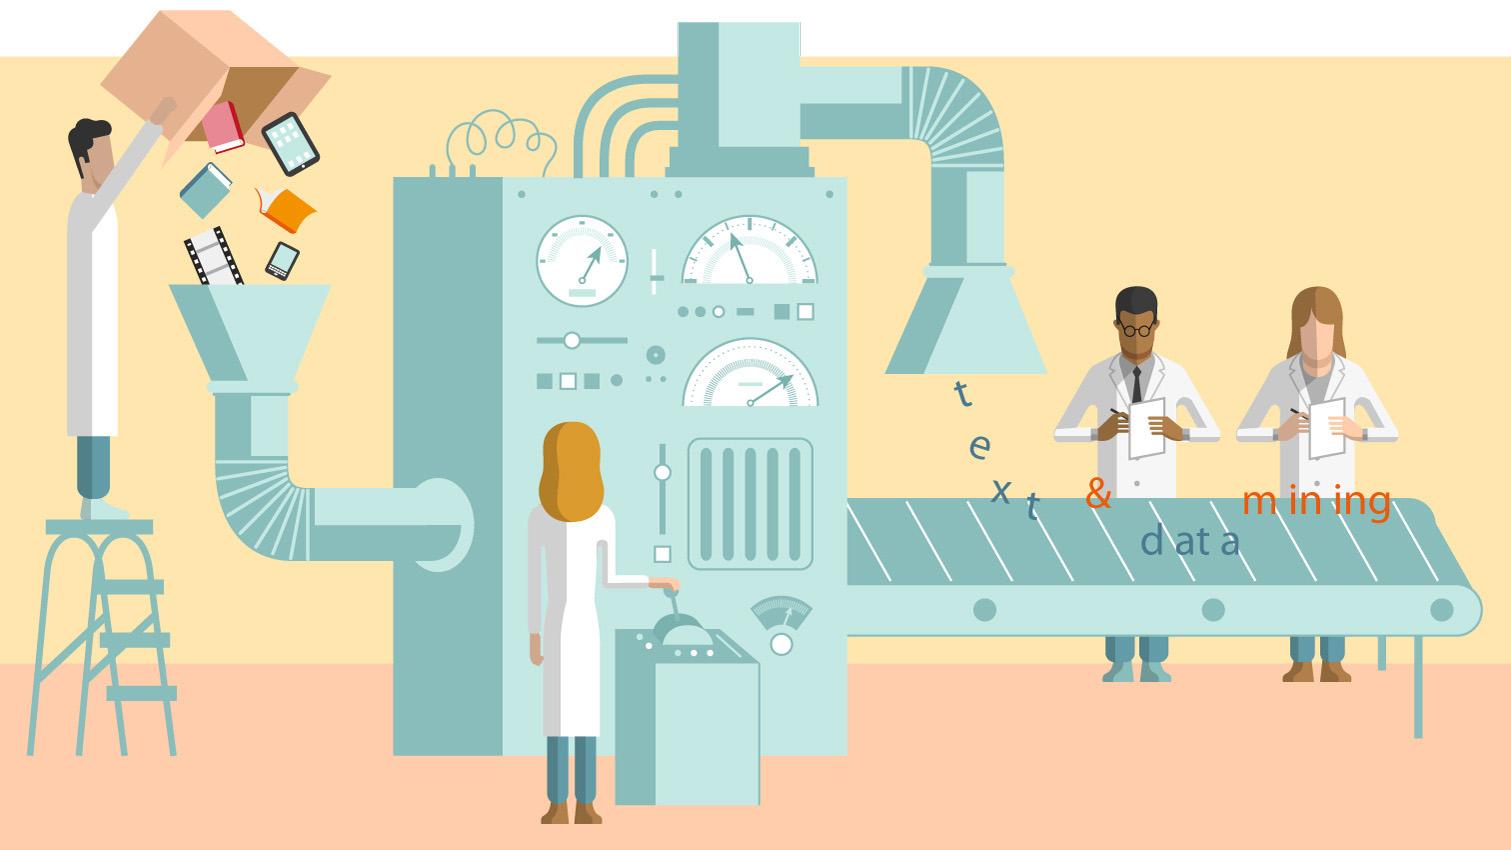 Data Mining un método profesional e importante para la toma de decisiones